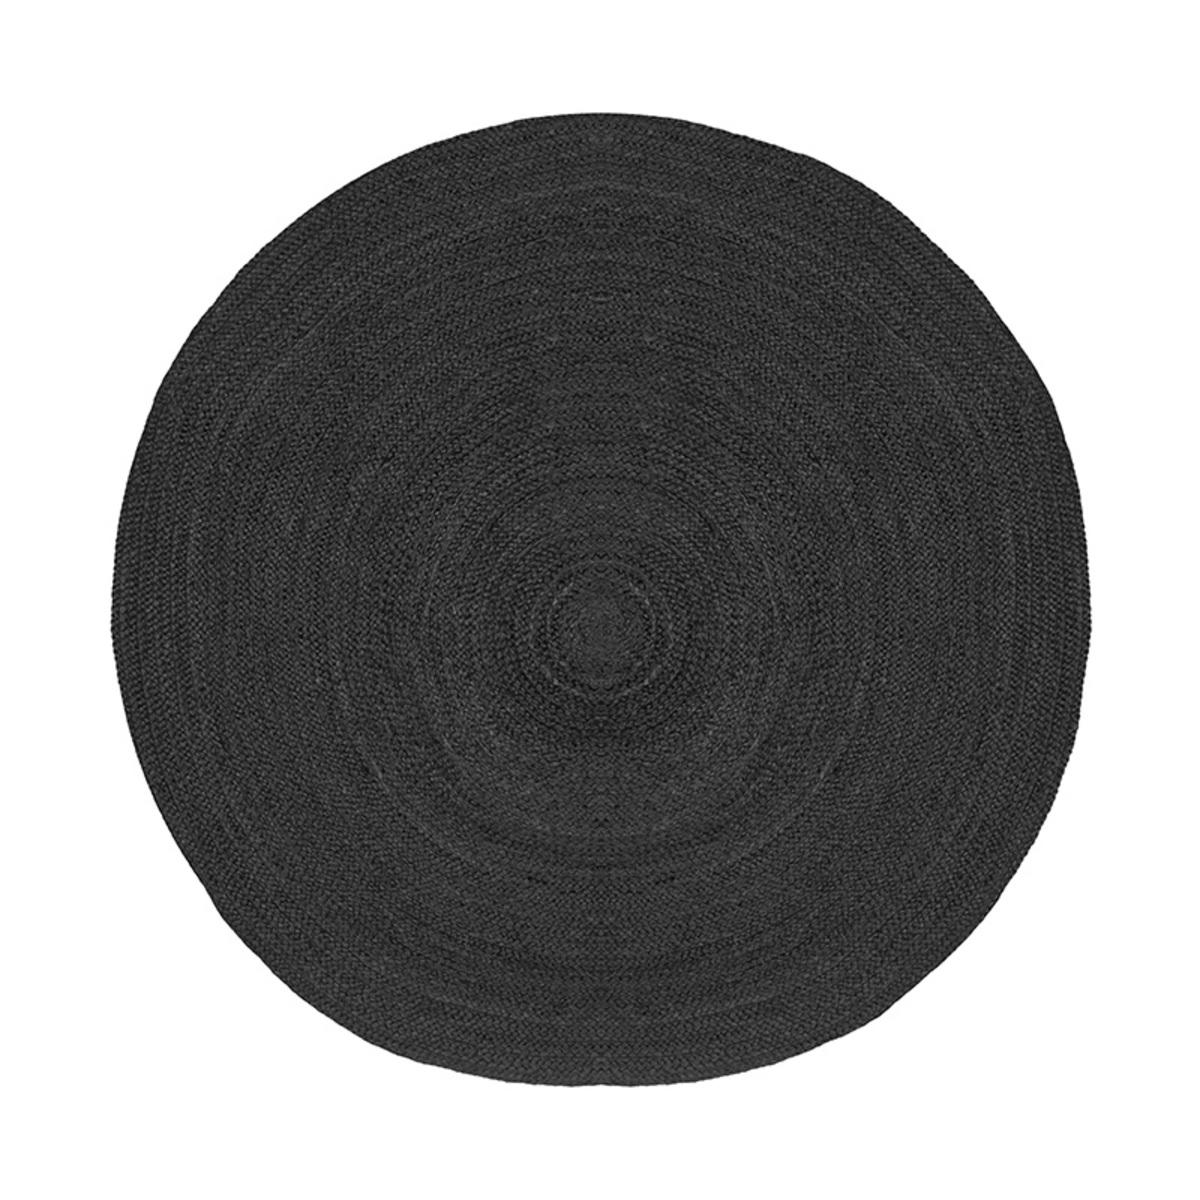 Vloerkleed Jute - Zwart - Jute - 180